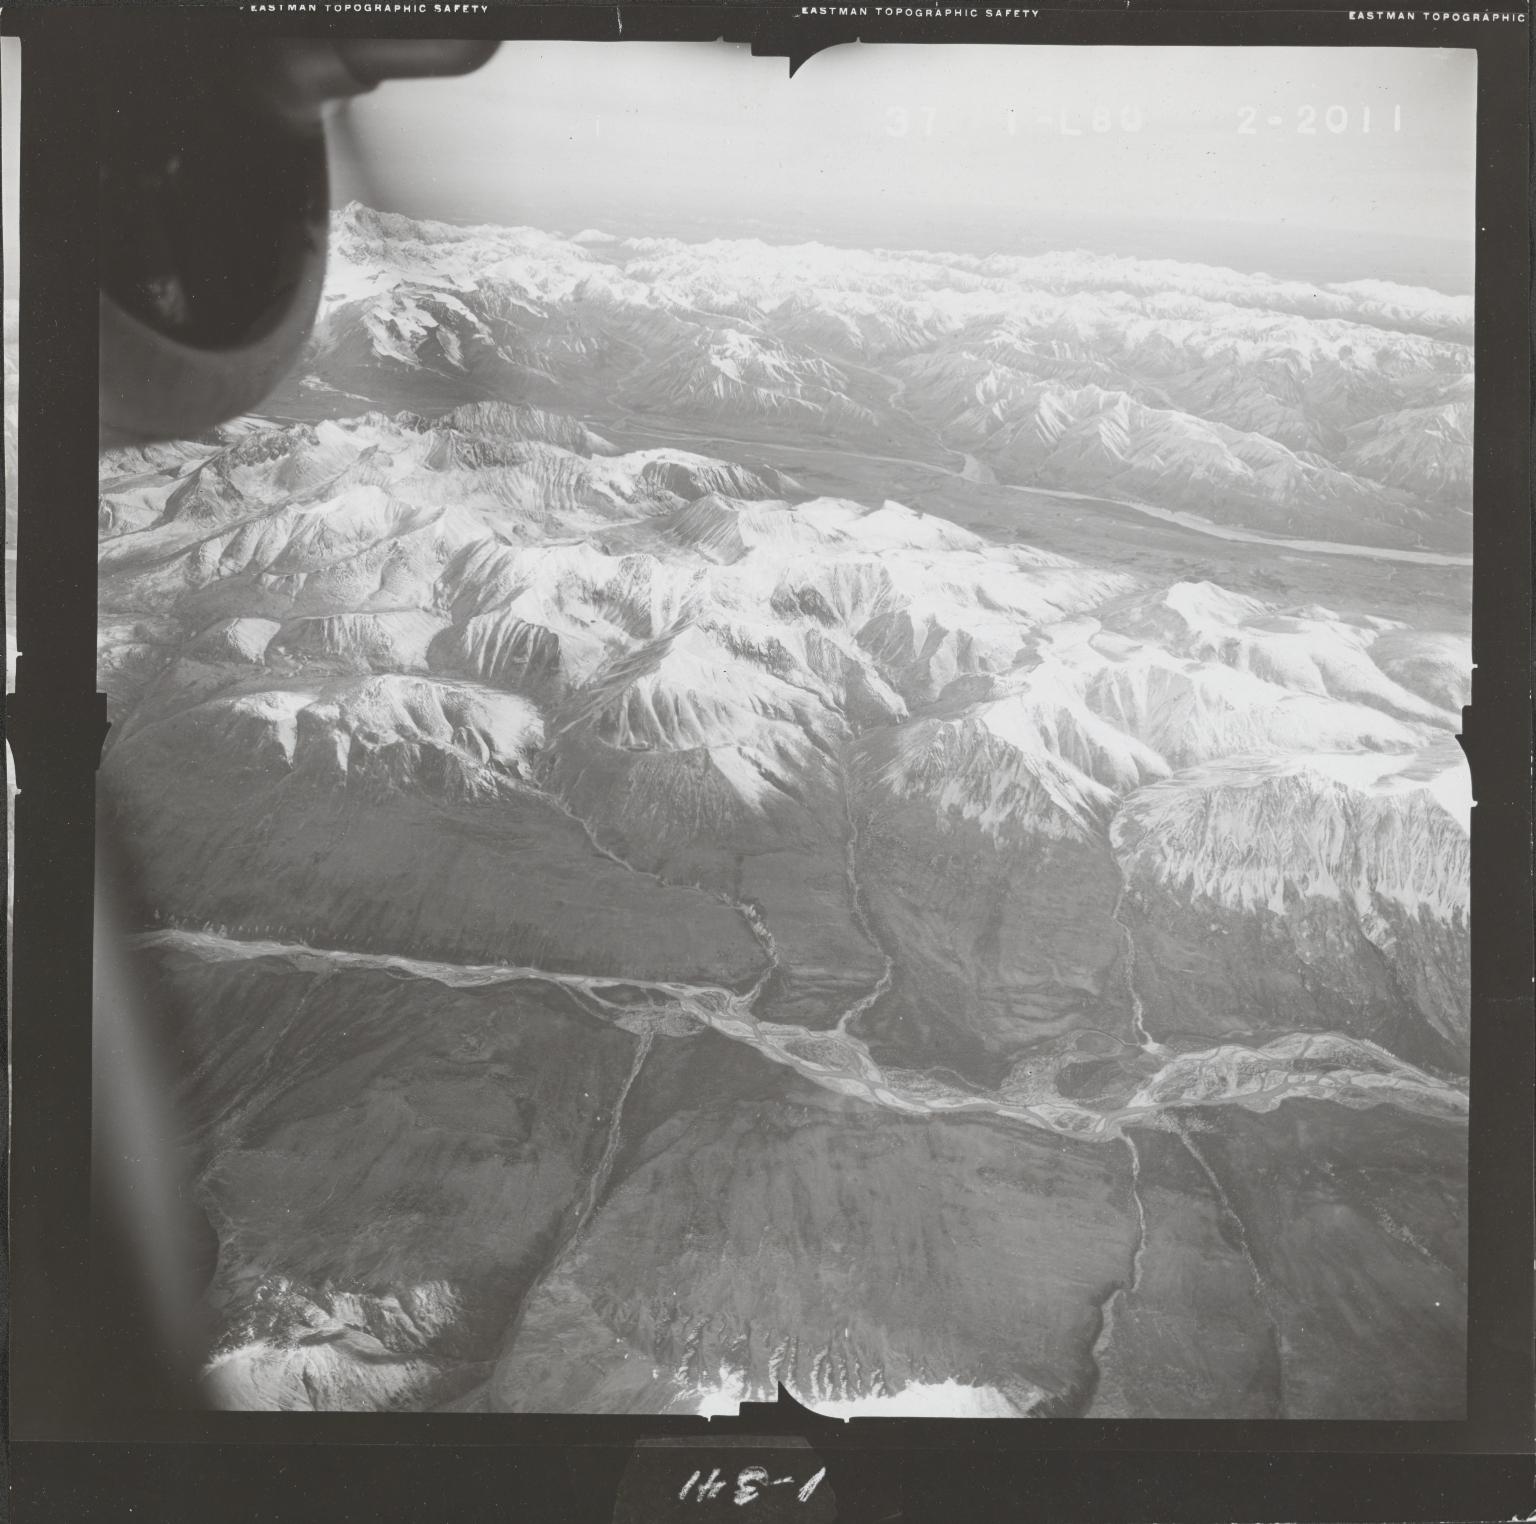 Alaska Range, aerial photograph FL 68 L-80, Alaska